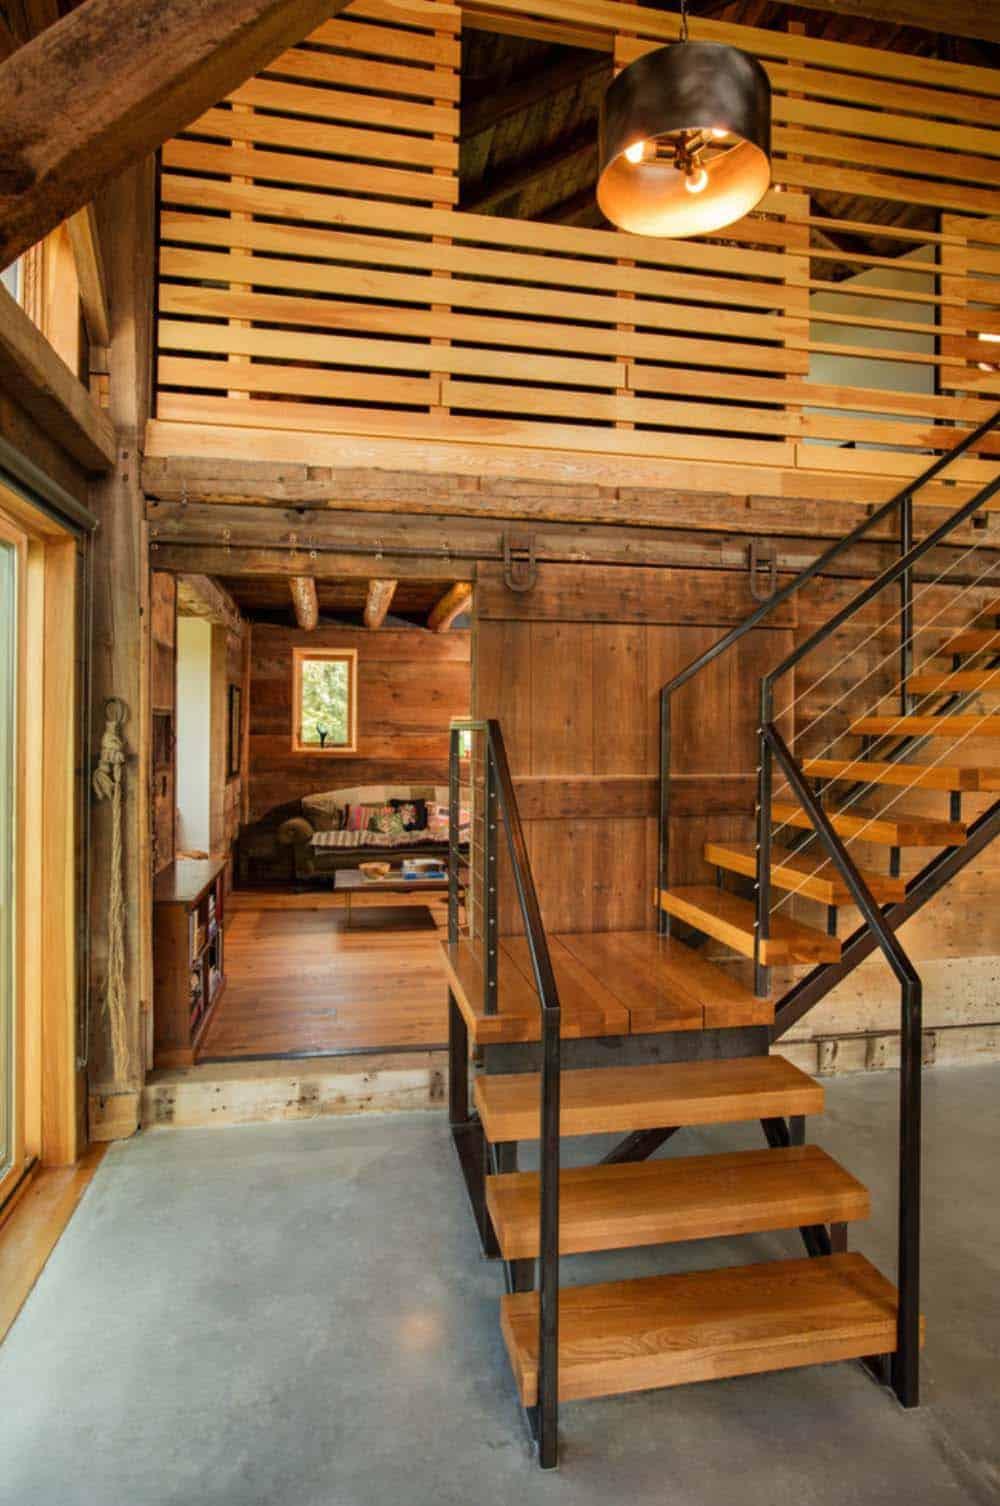 Rustic Barn Guesthouse-Joan Heaton Architects-13-1 Kindesign